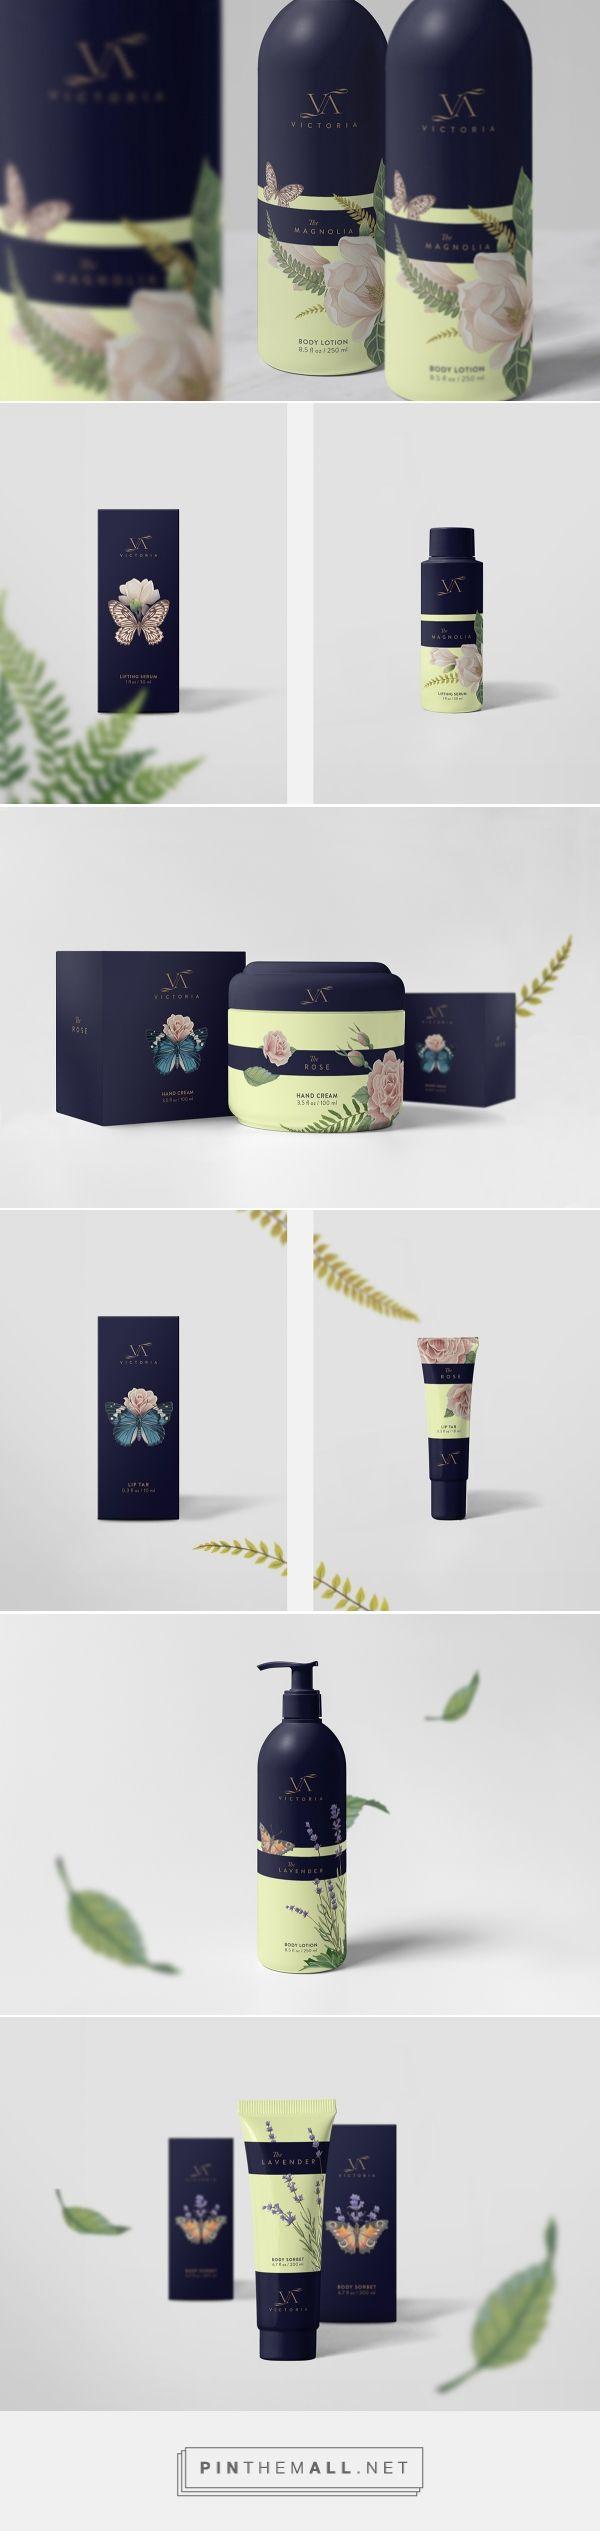 Victoria Cosmetics on Behance  | Fivestar Branding – Design and Branding Agency & Inspiration Gallery